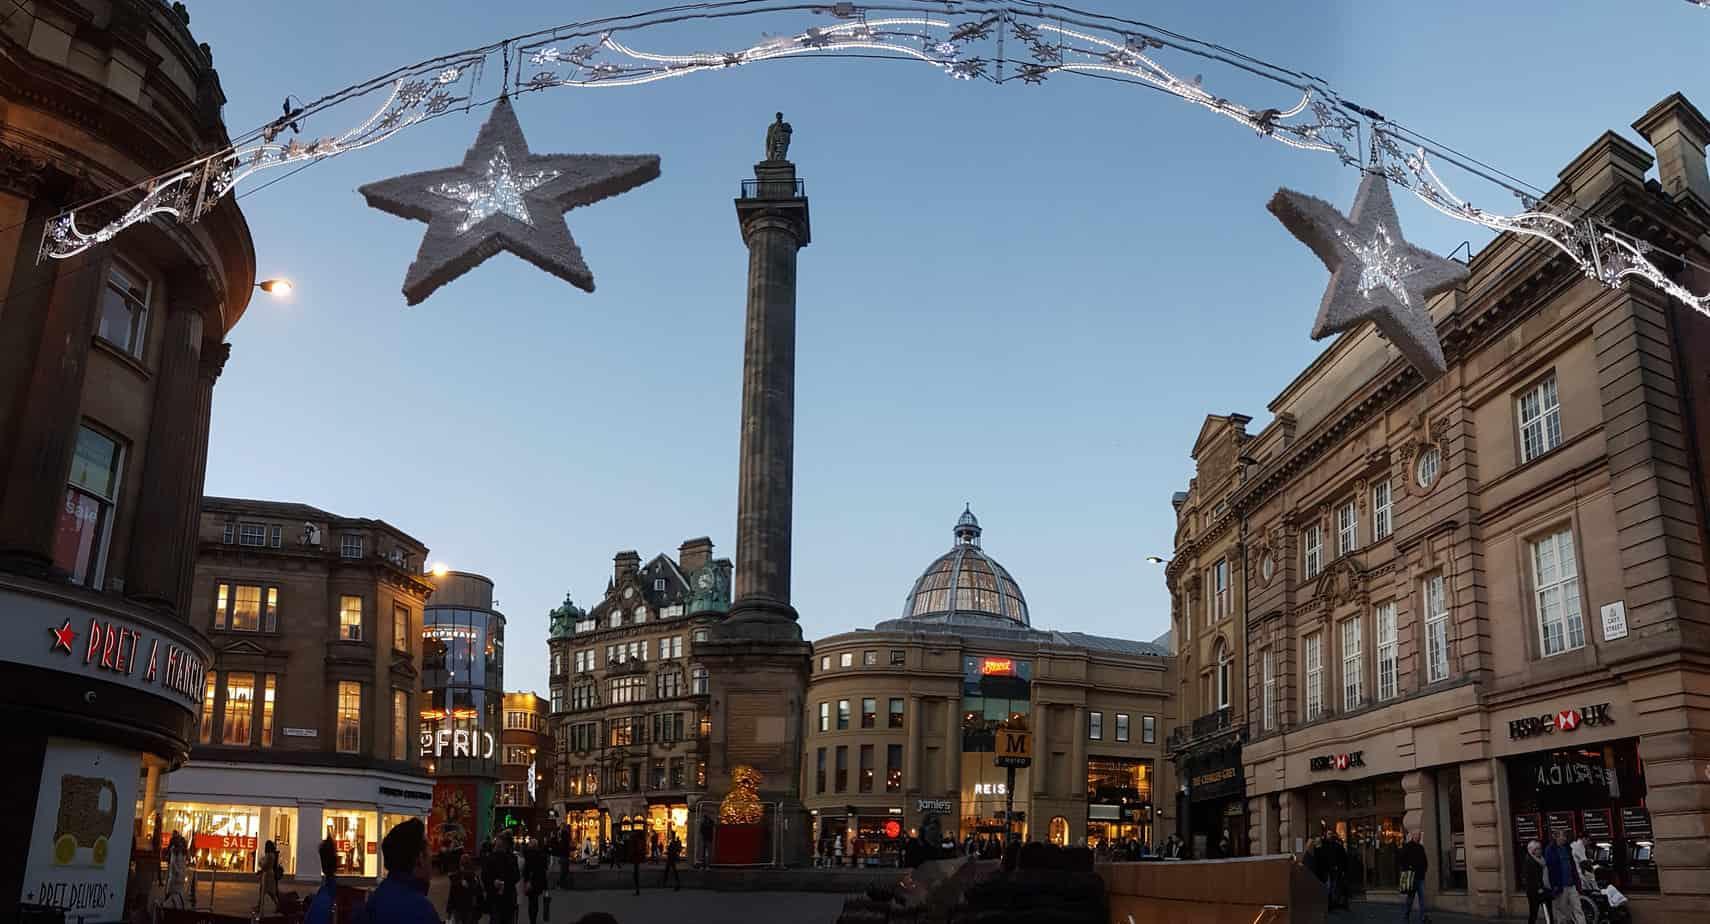 Grey's Monument Newcastle